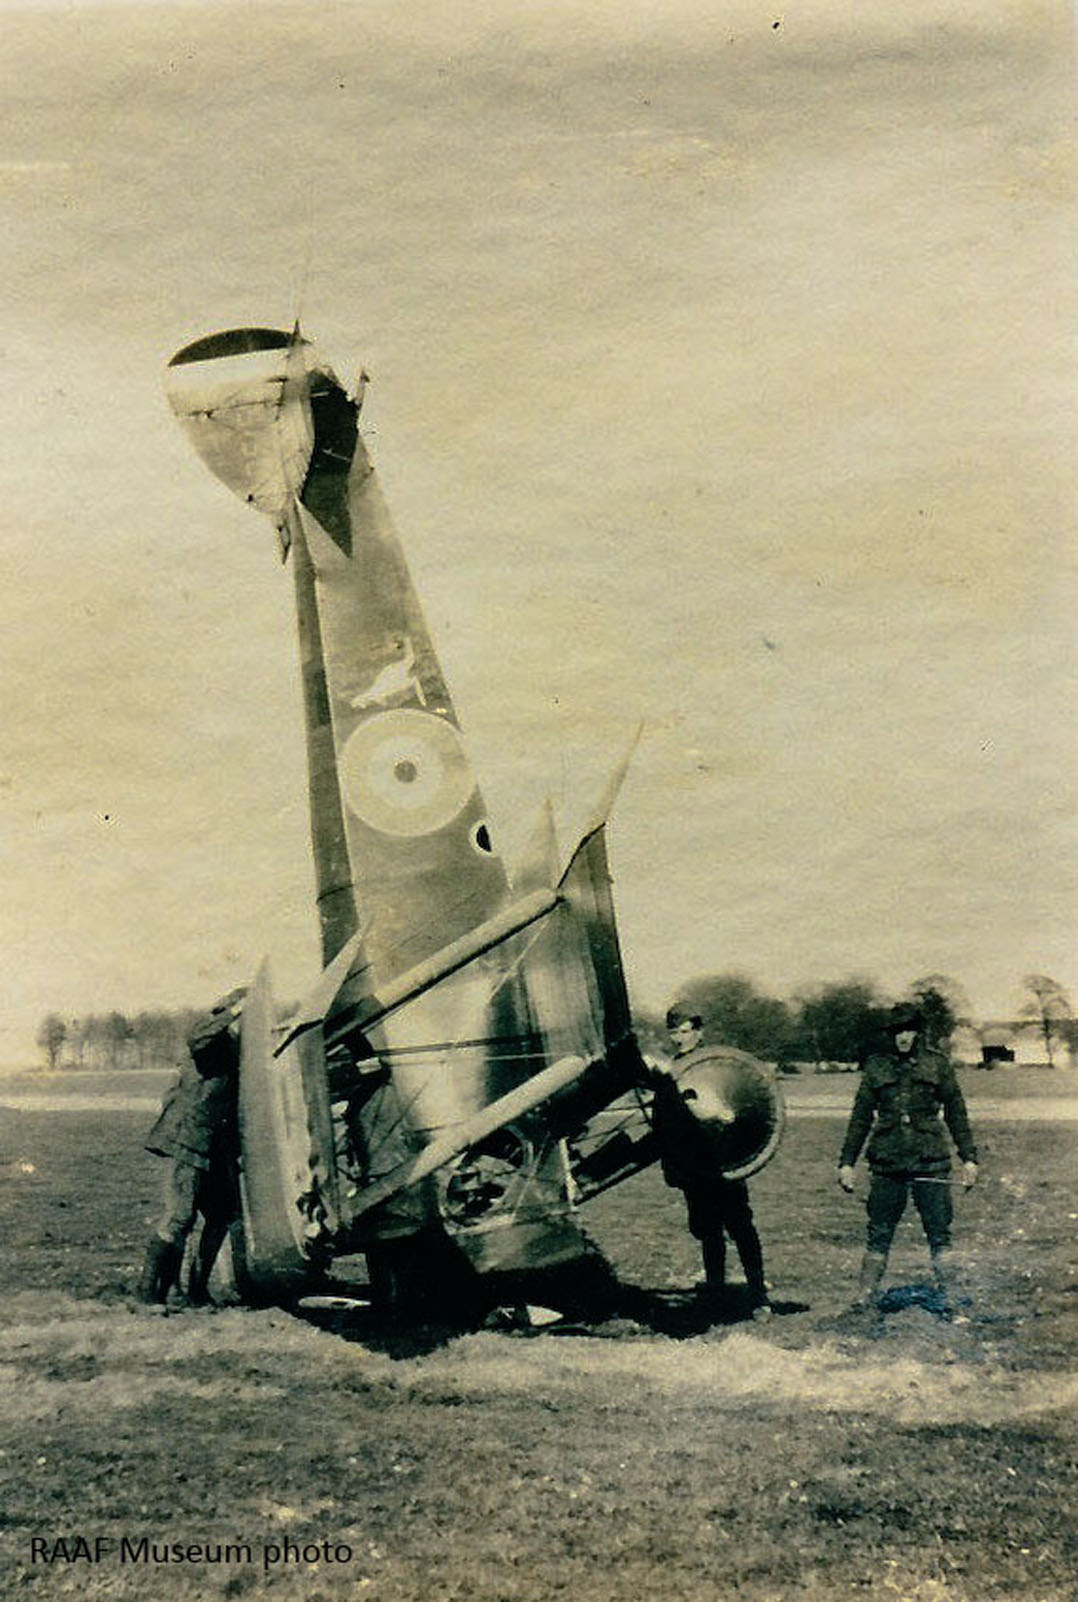 A damaged Australian Sopwith Camel as flown by 4 Sqn AFC (RAAF Museum)